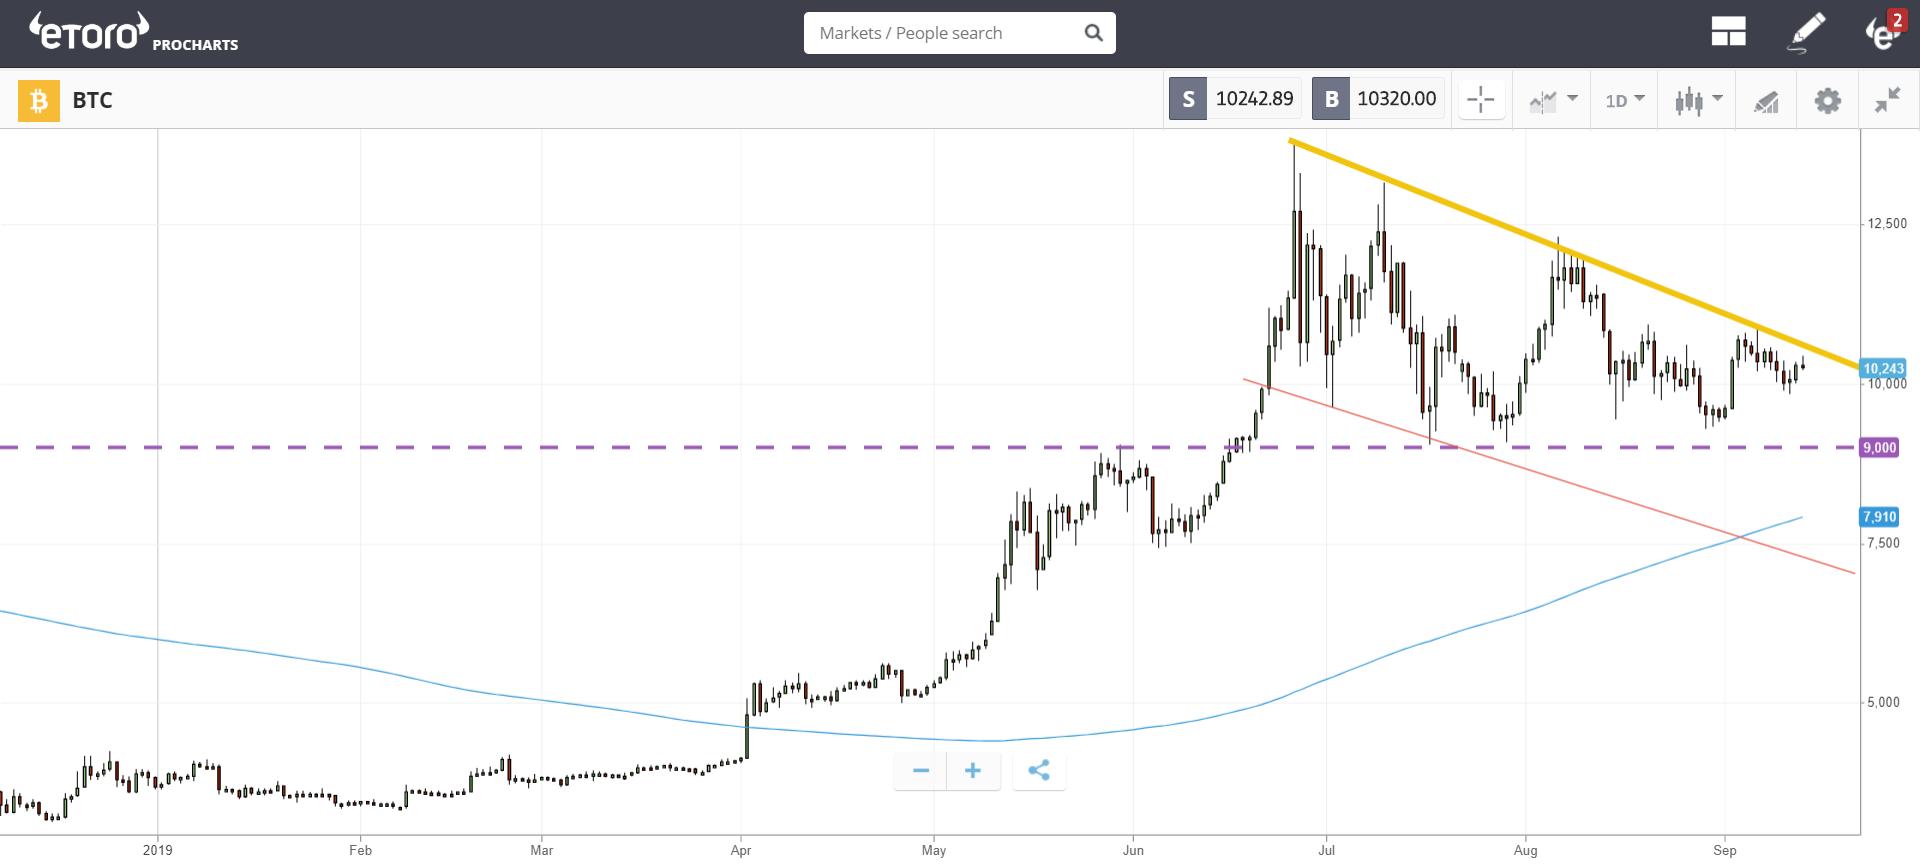 market, cryptocurrency, bitcoin, blockchain, trade, United States, economy